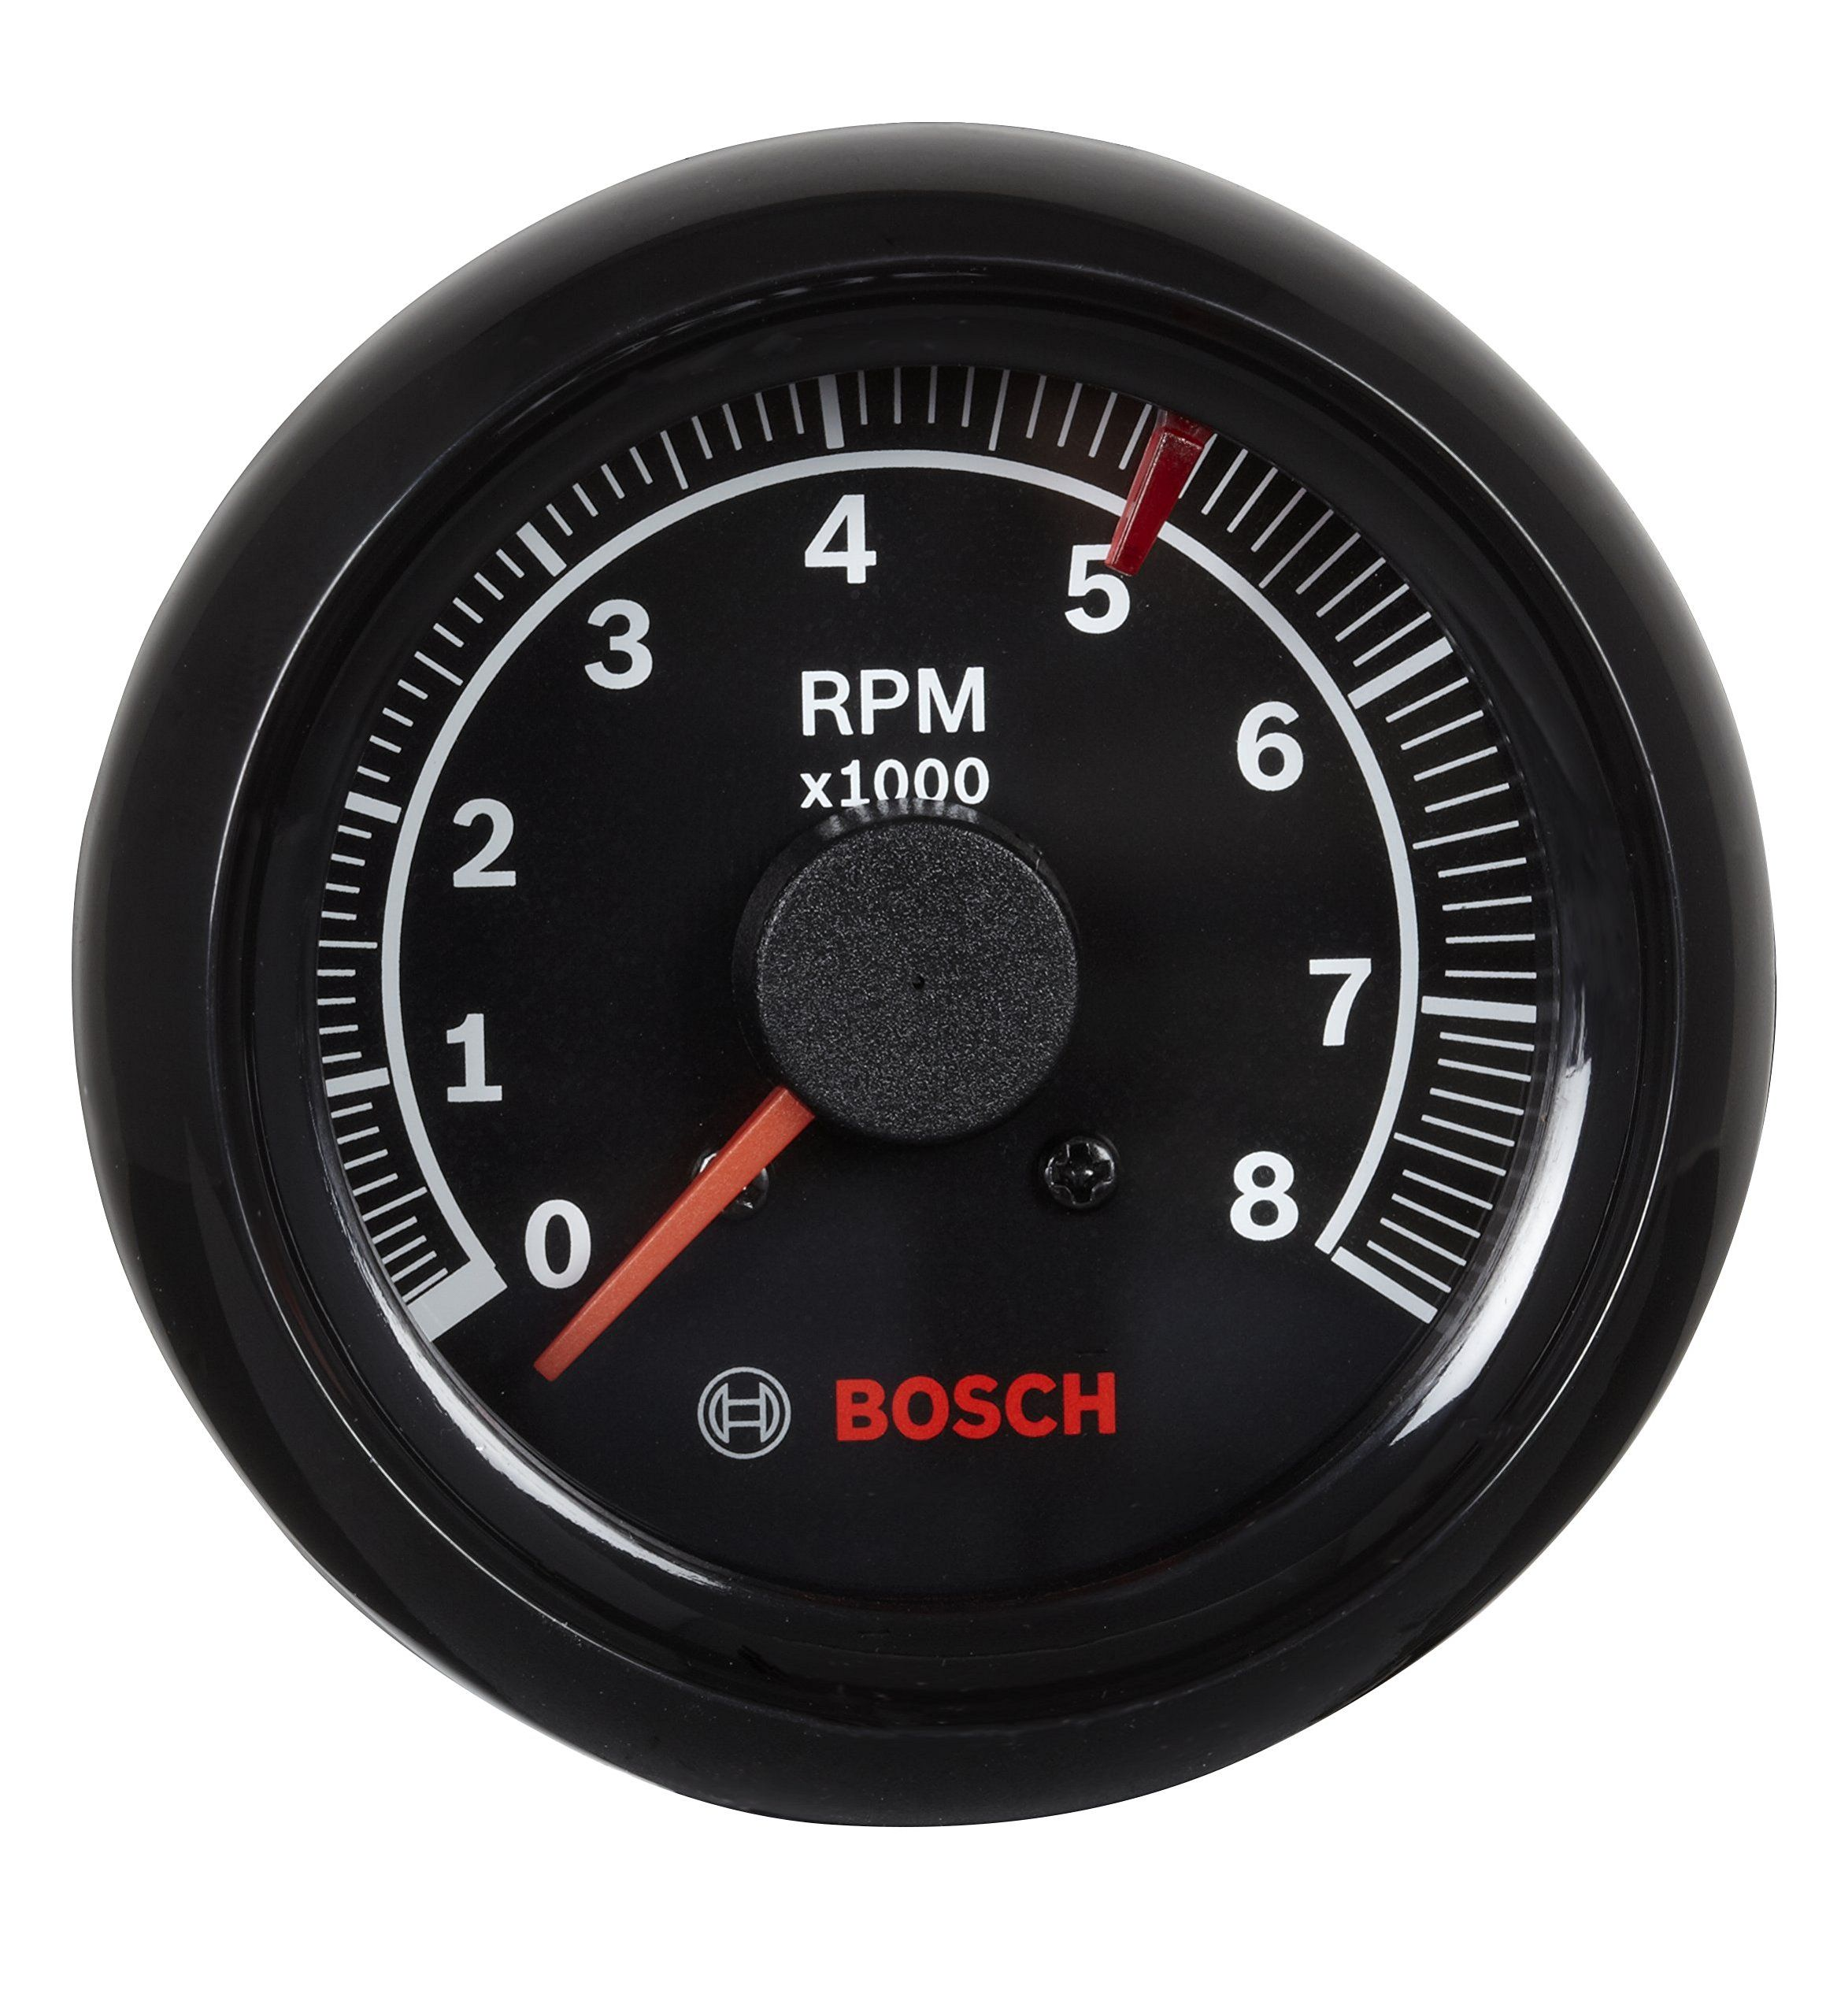 32 89 Bosch Sp0f000025 Sport Ii 2 8 U0026quot  Tachometer  Black